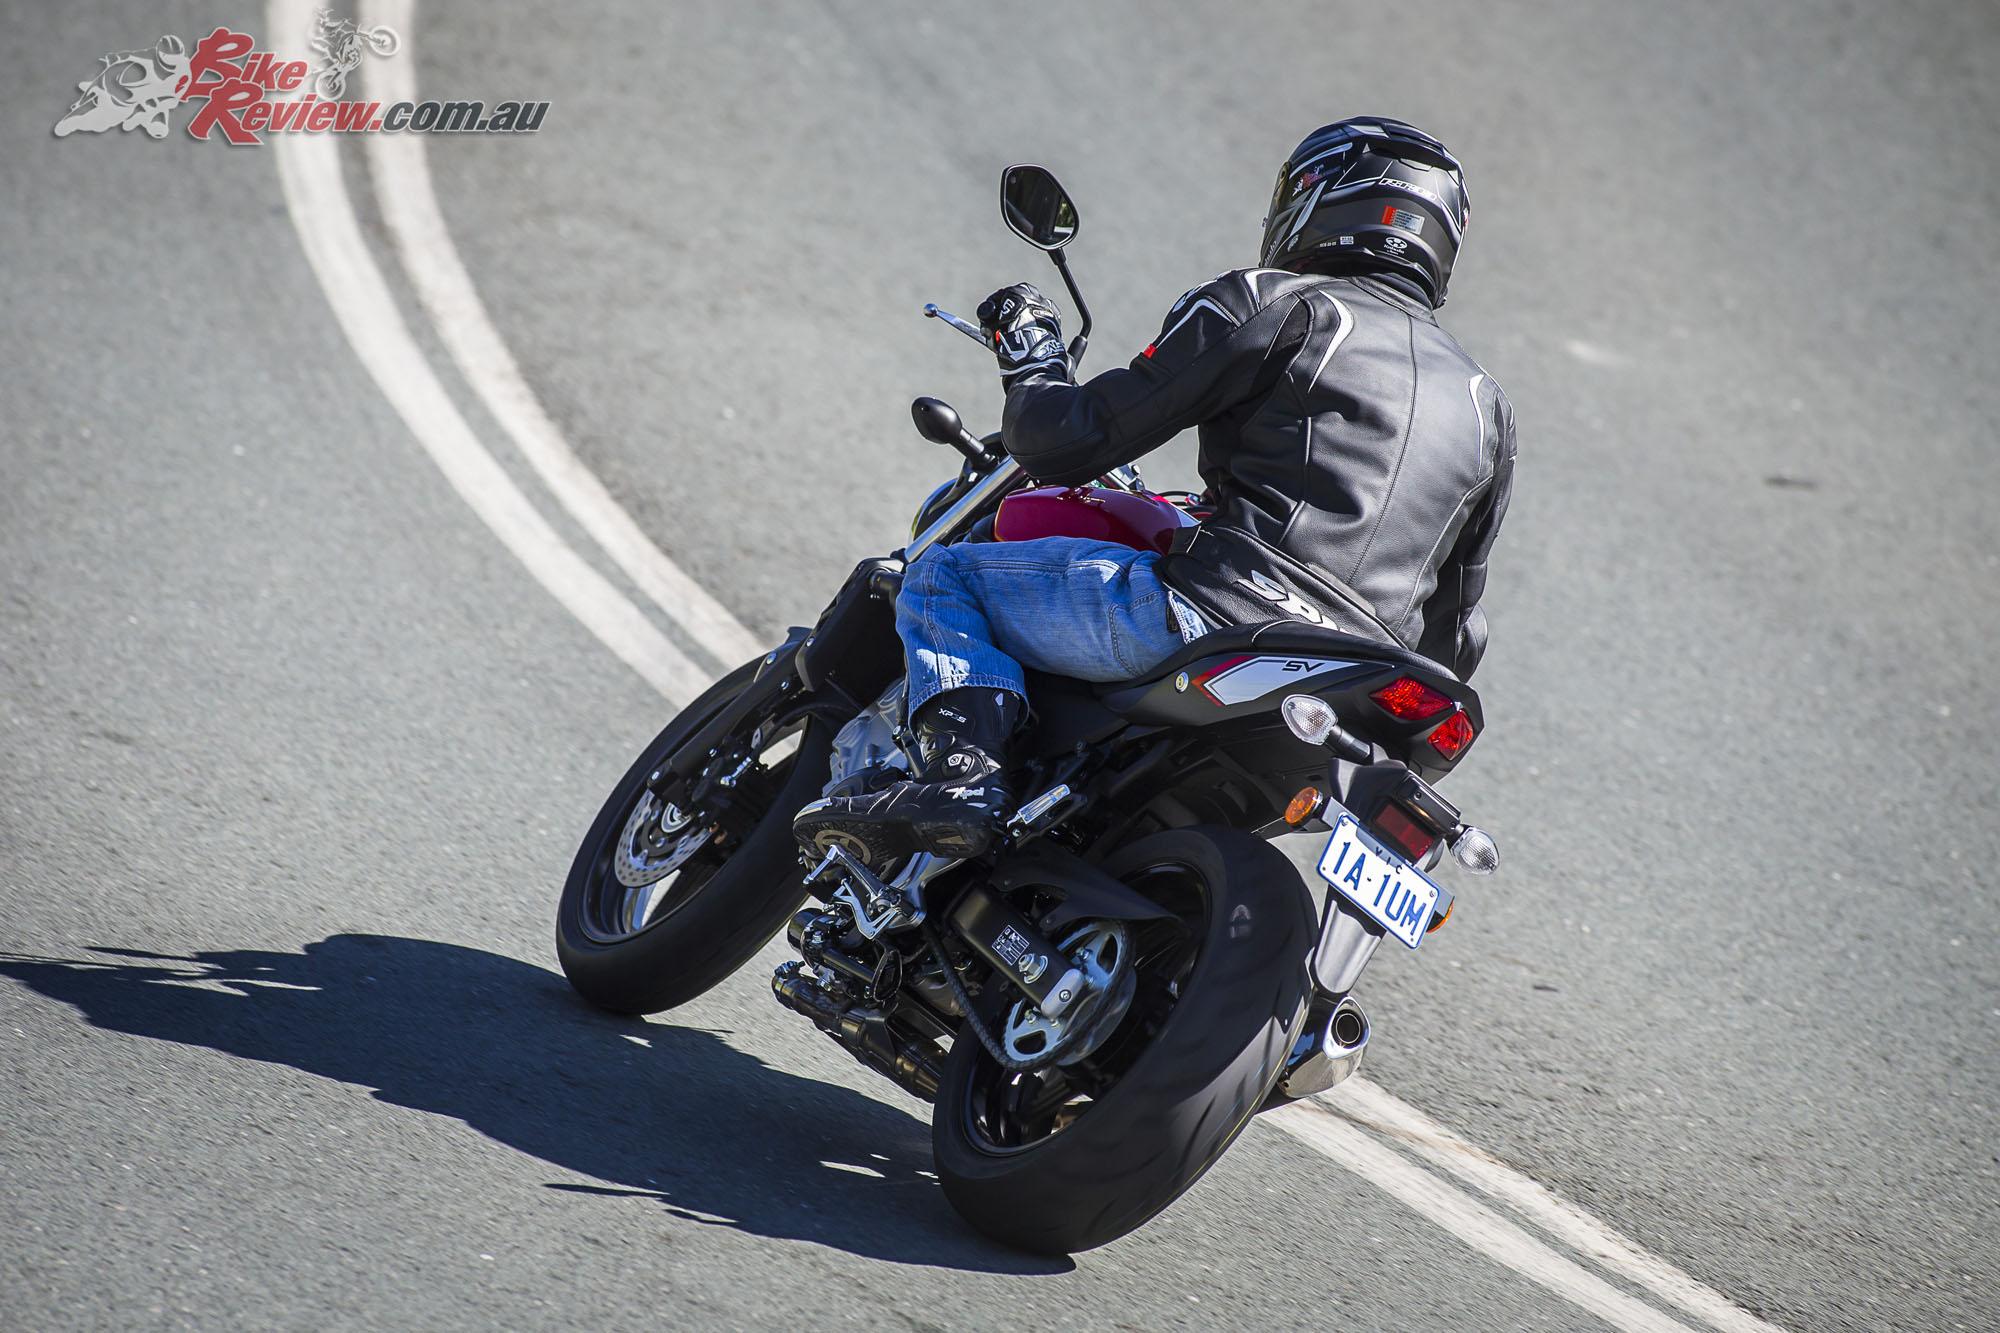 Review 2017 Suzuki Sv650 Lams Bike Review